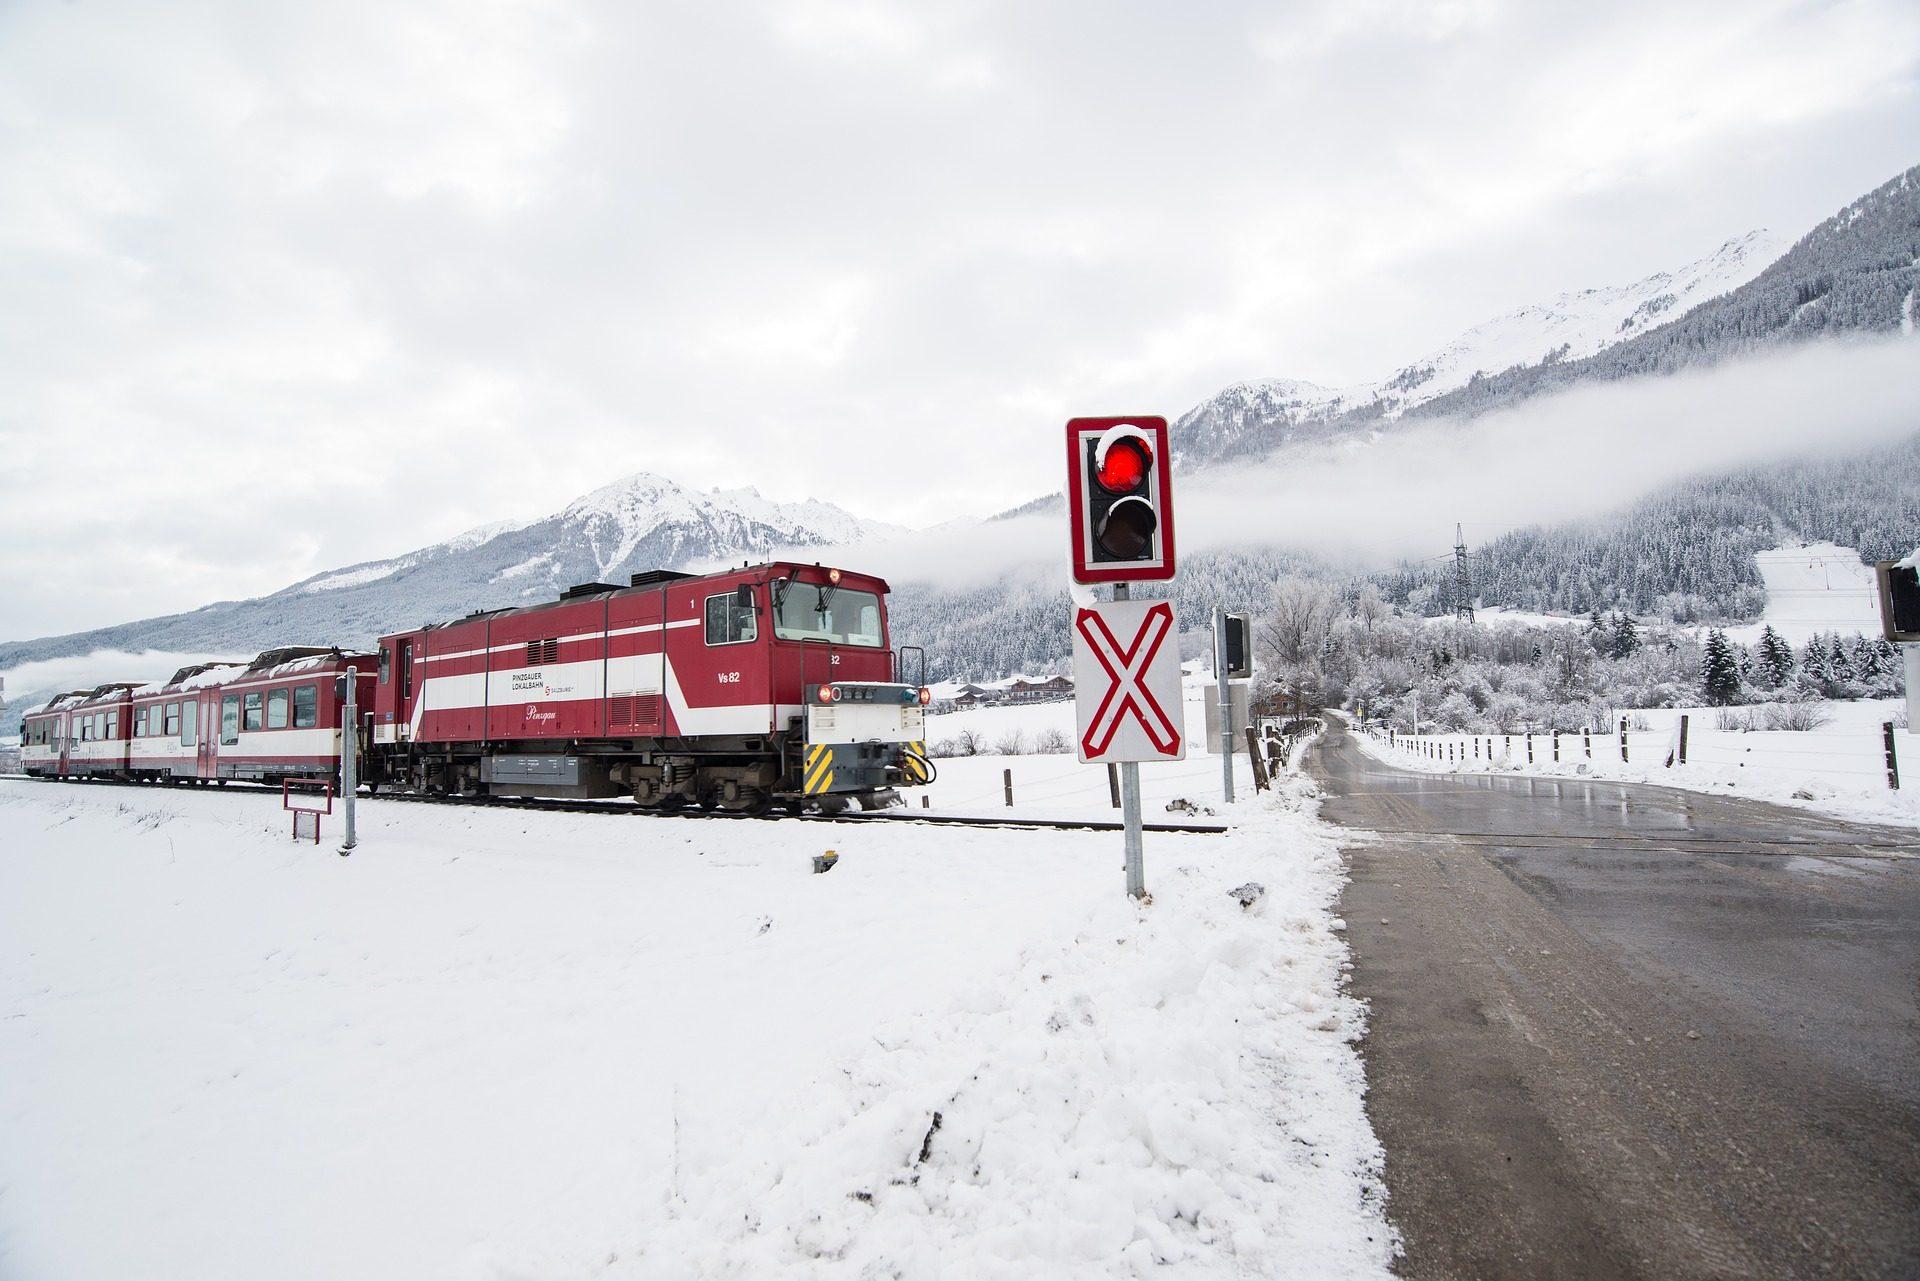 tren, 鉄道, トラフィック ライト, クロッシング, 雪, モンタナス - HD の壁紙 - 教授-falken.com